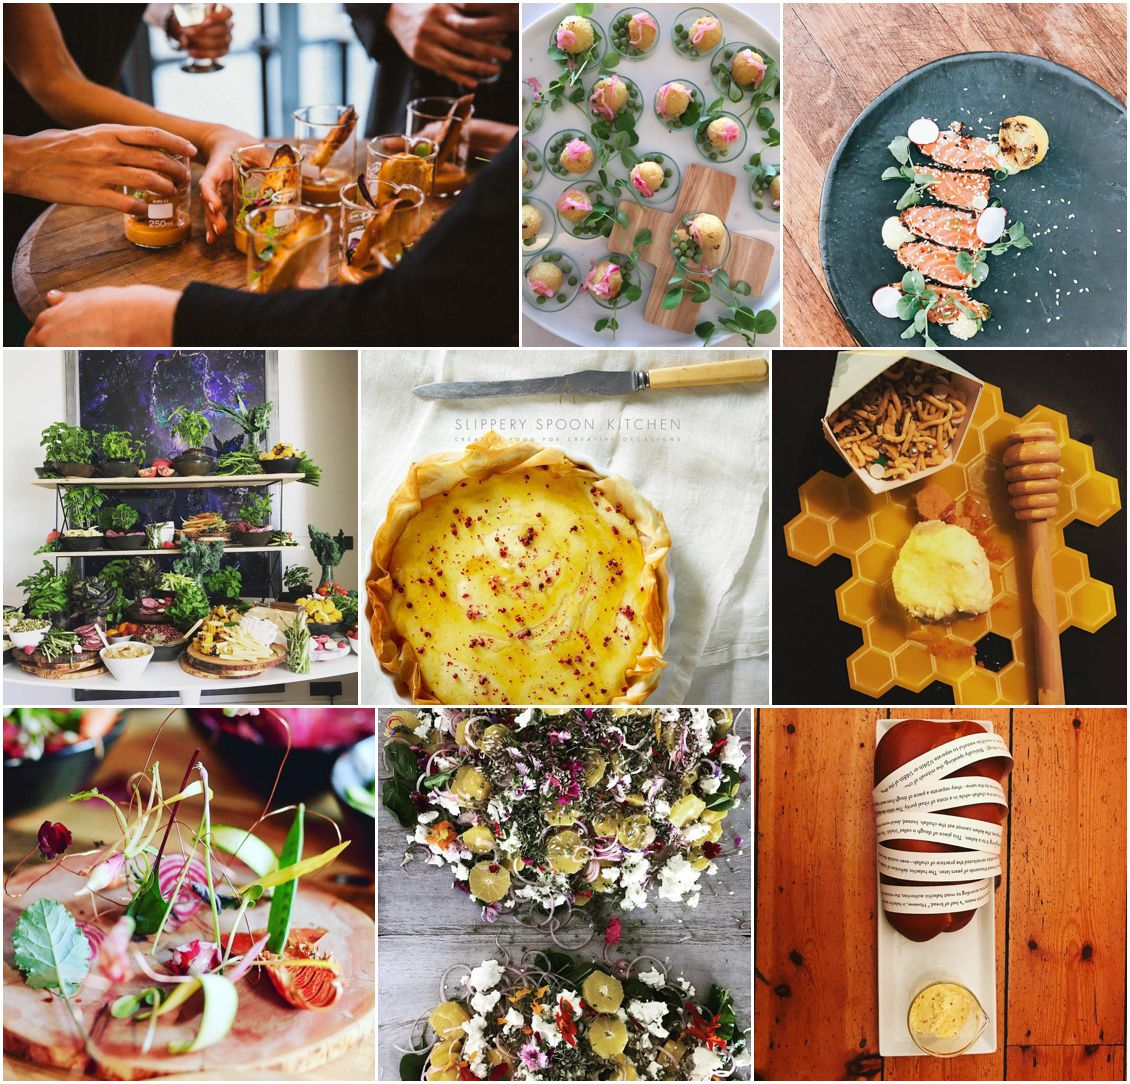 #16 - Slippery Spoon Kitchen - Wedding Cuisine